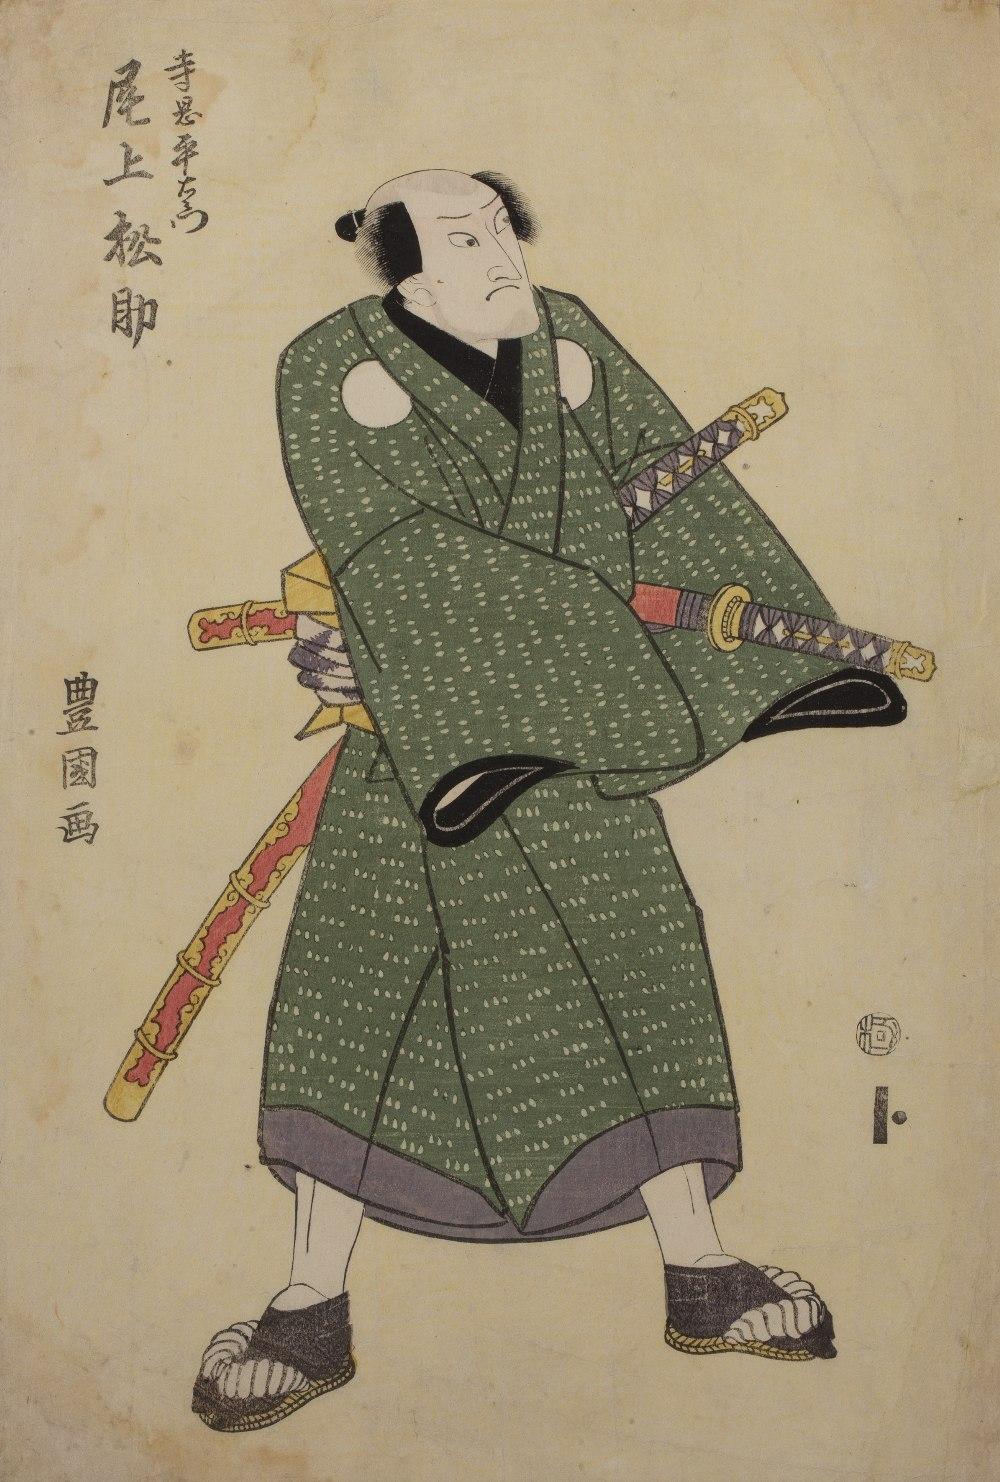 Utagawa Toyokuni I (1769-1825) 'Onoe Matsuki II as a Samurai' Japanese woodblock, mounted, but